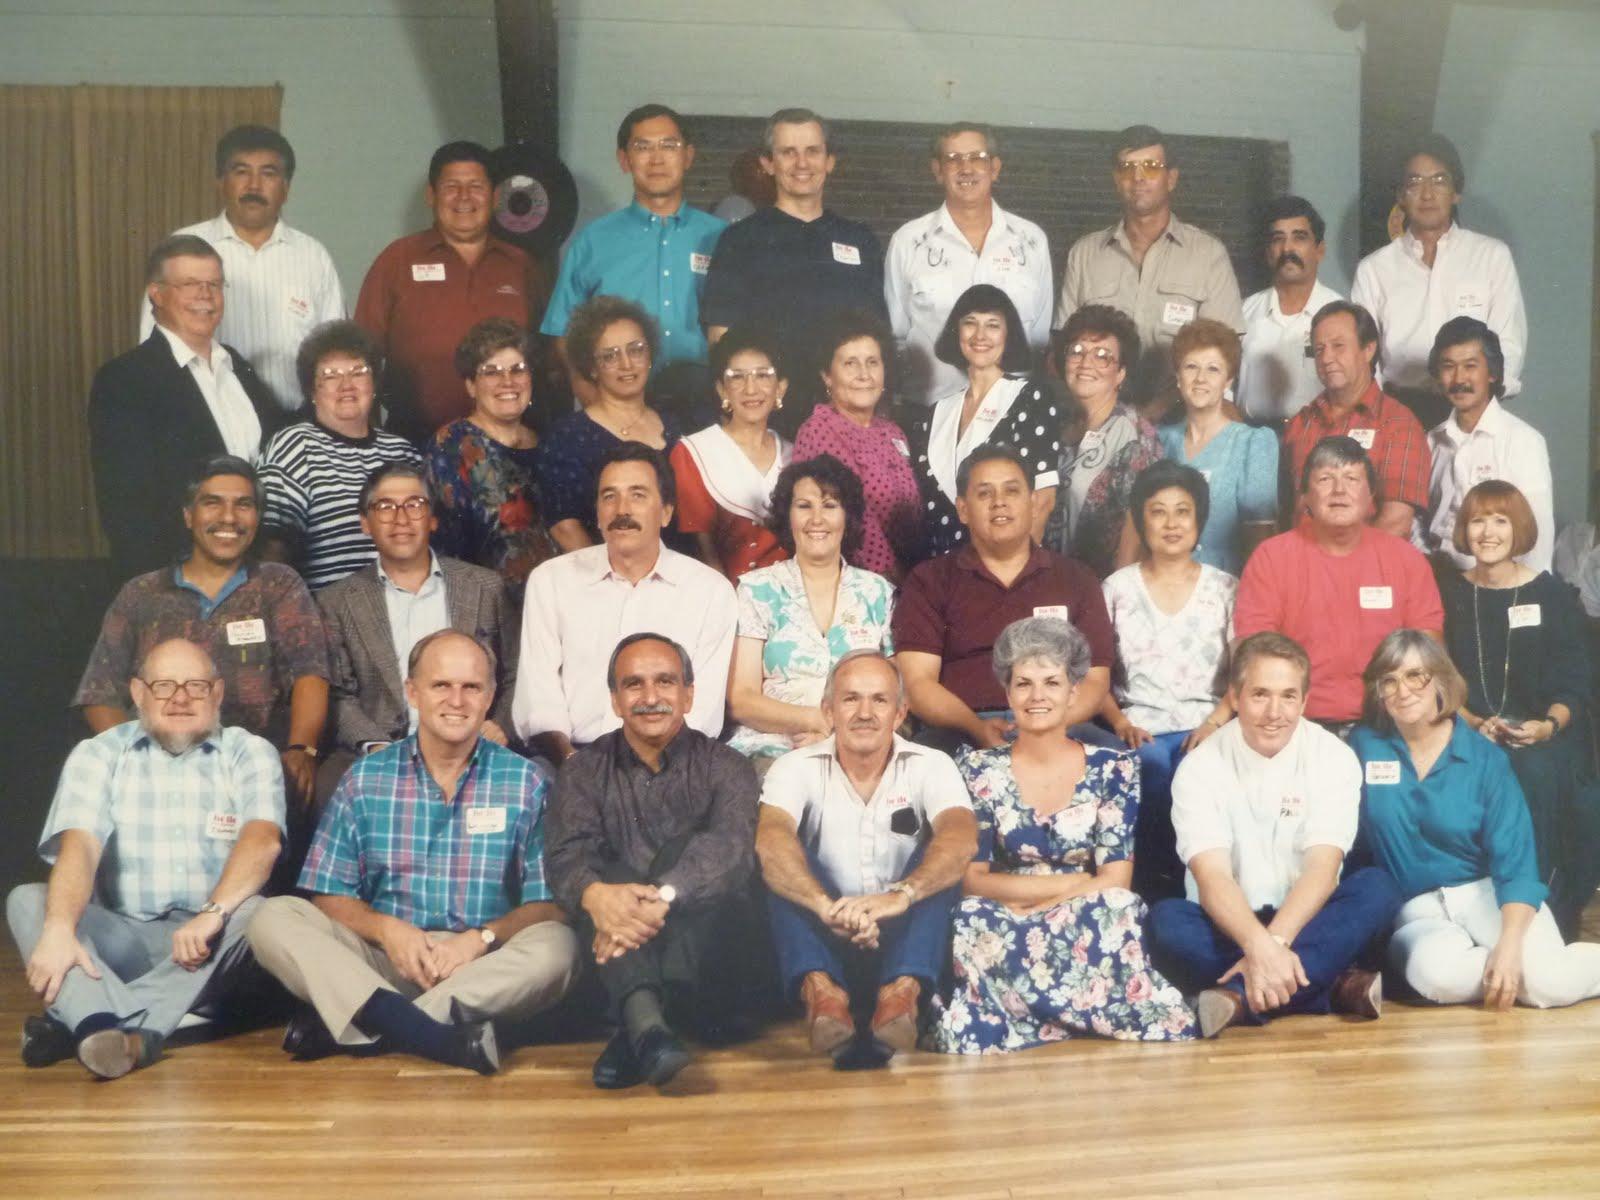 Orosi union high school 1961 50th reunion 30 year reunion of 1961